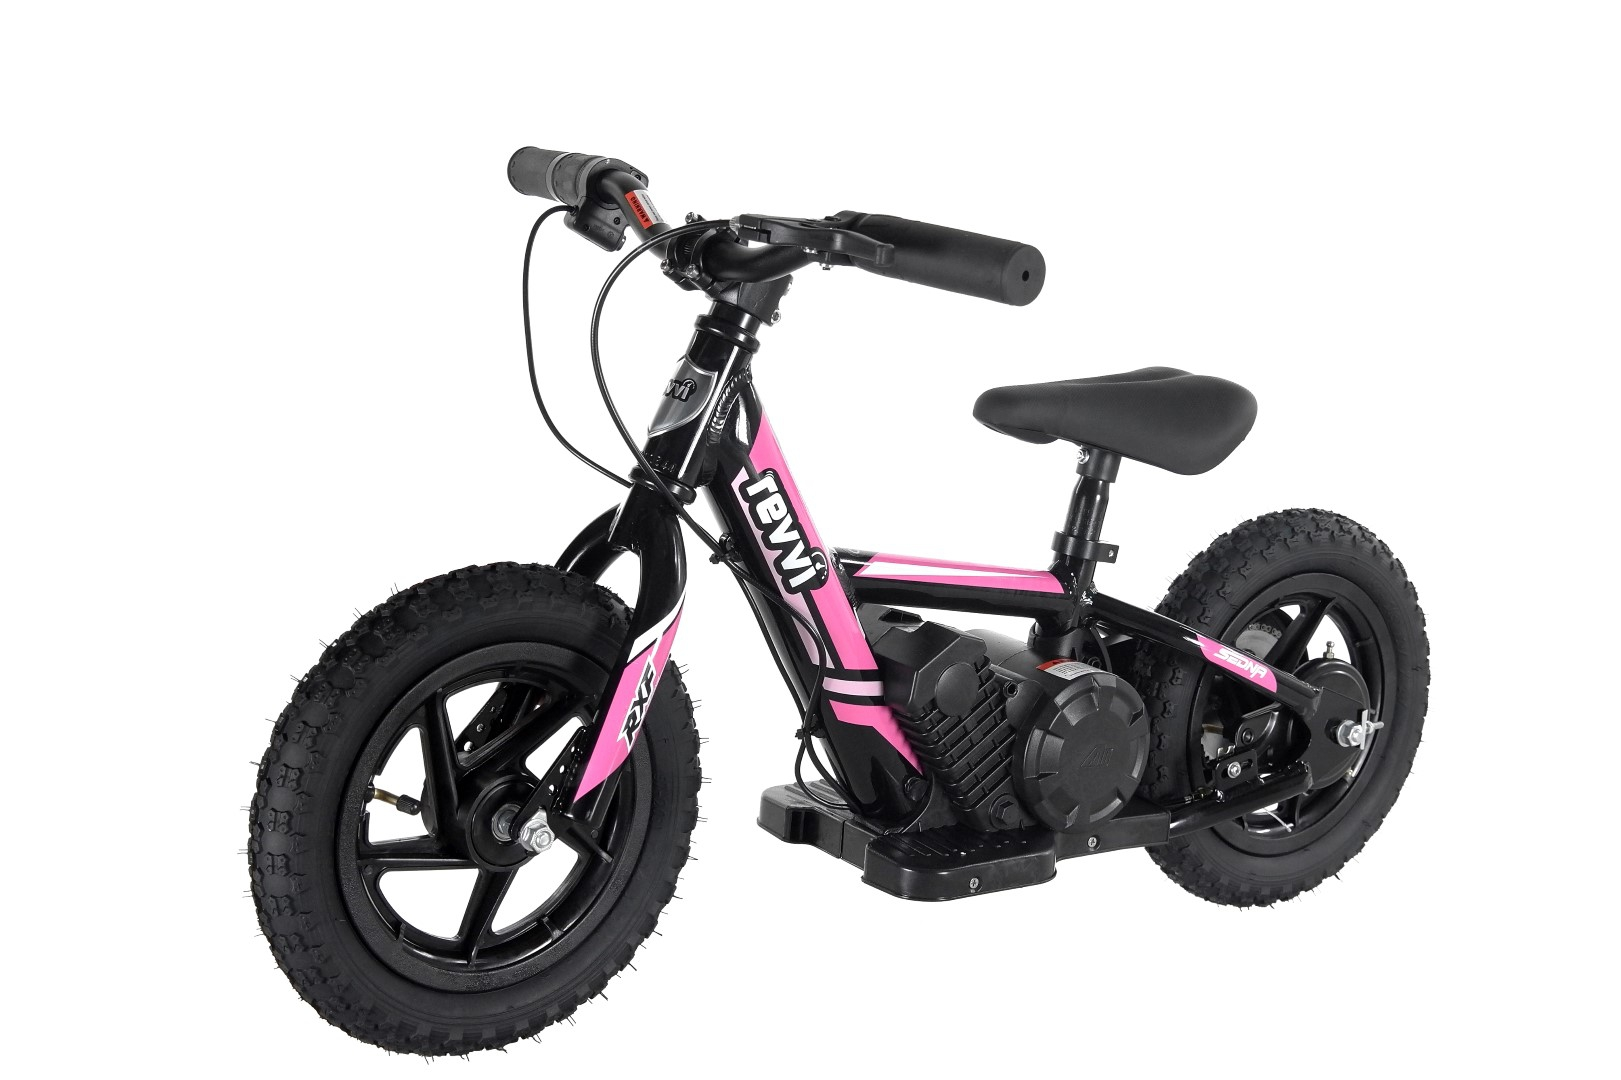 Kids 100w Electric Balance Bike - Revvi Twelve - Pink